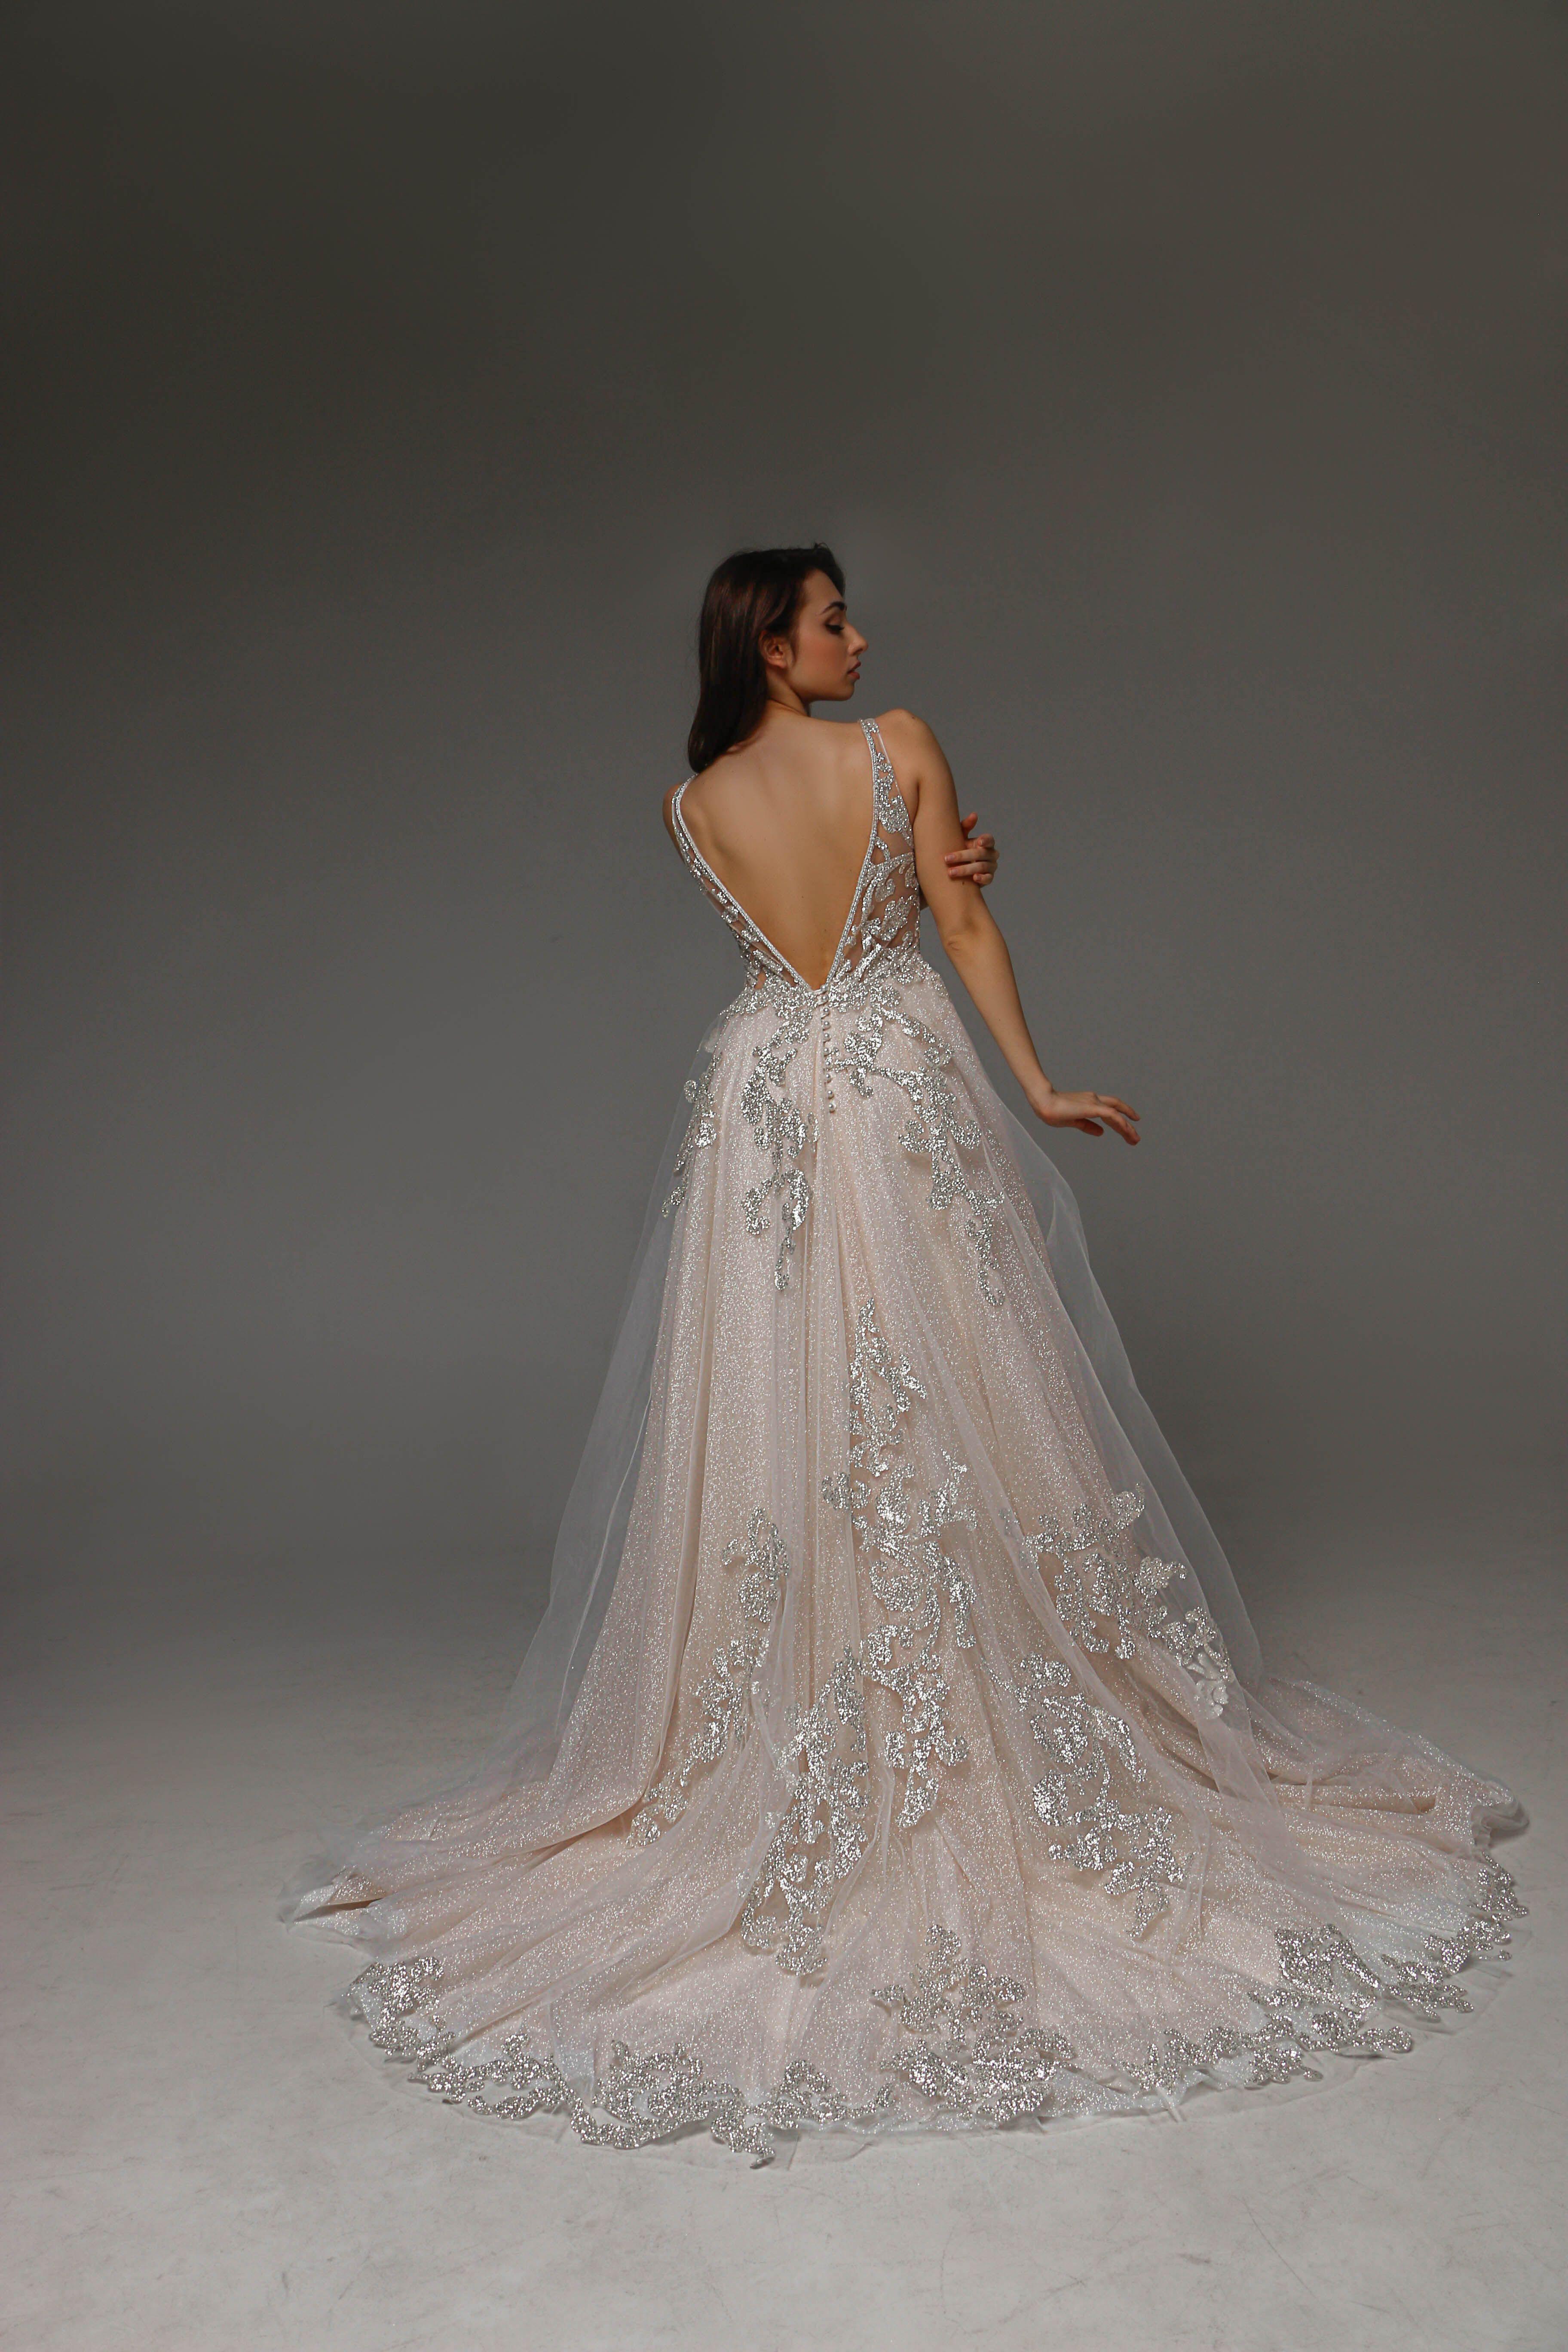 Pin on Boho wedding dress